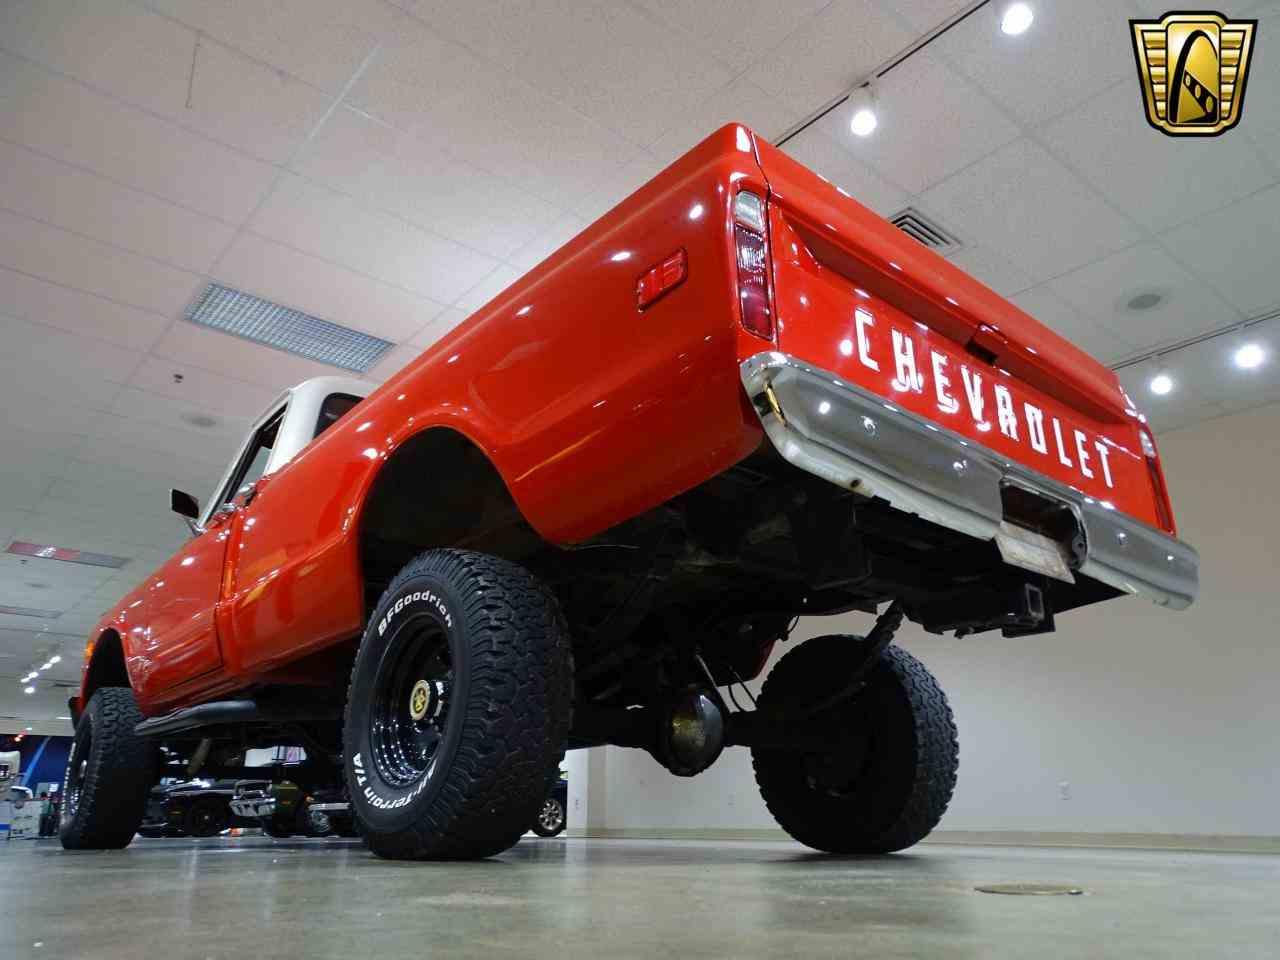 Large Picture of Classic 1972 K-10 located in O'Fallon Illinois - $22,995.00 - MFDJ